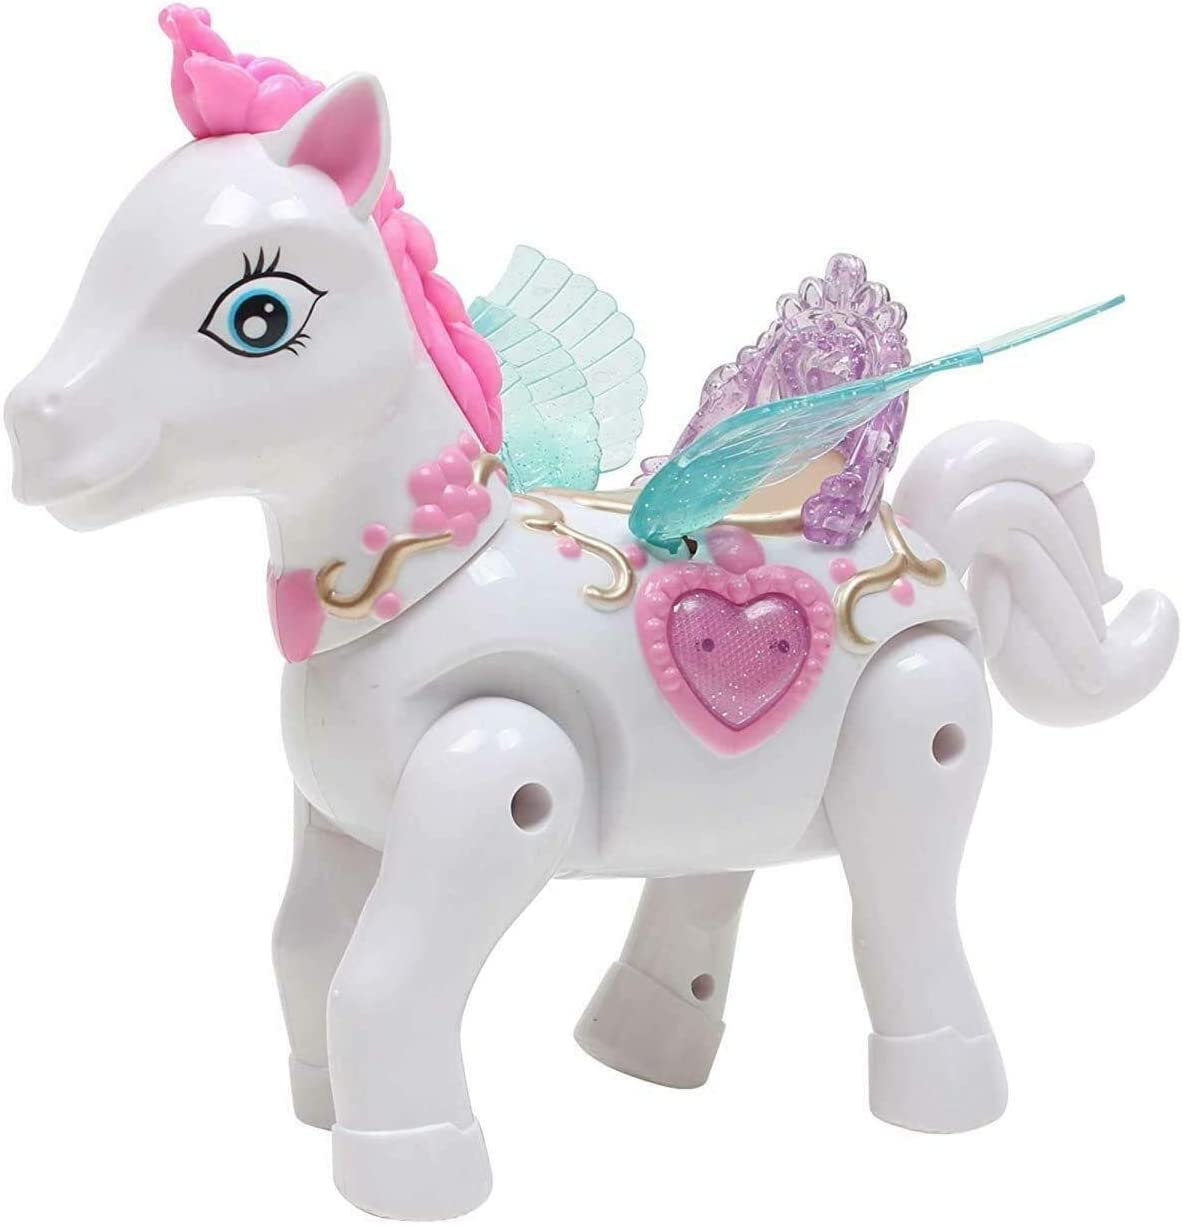 CHILDREN Kids Princess toys ELVES Horse Light Music Walk Around fairy TOY uk